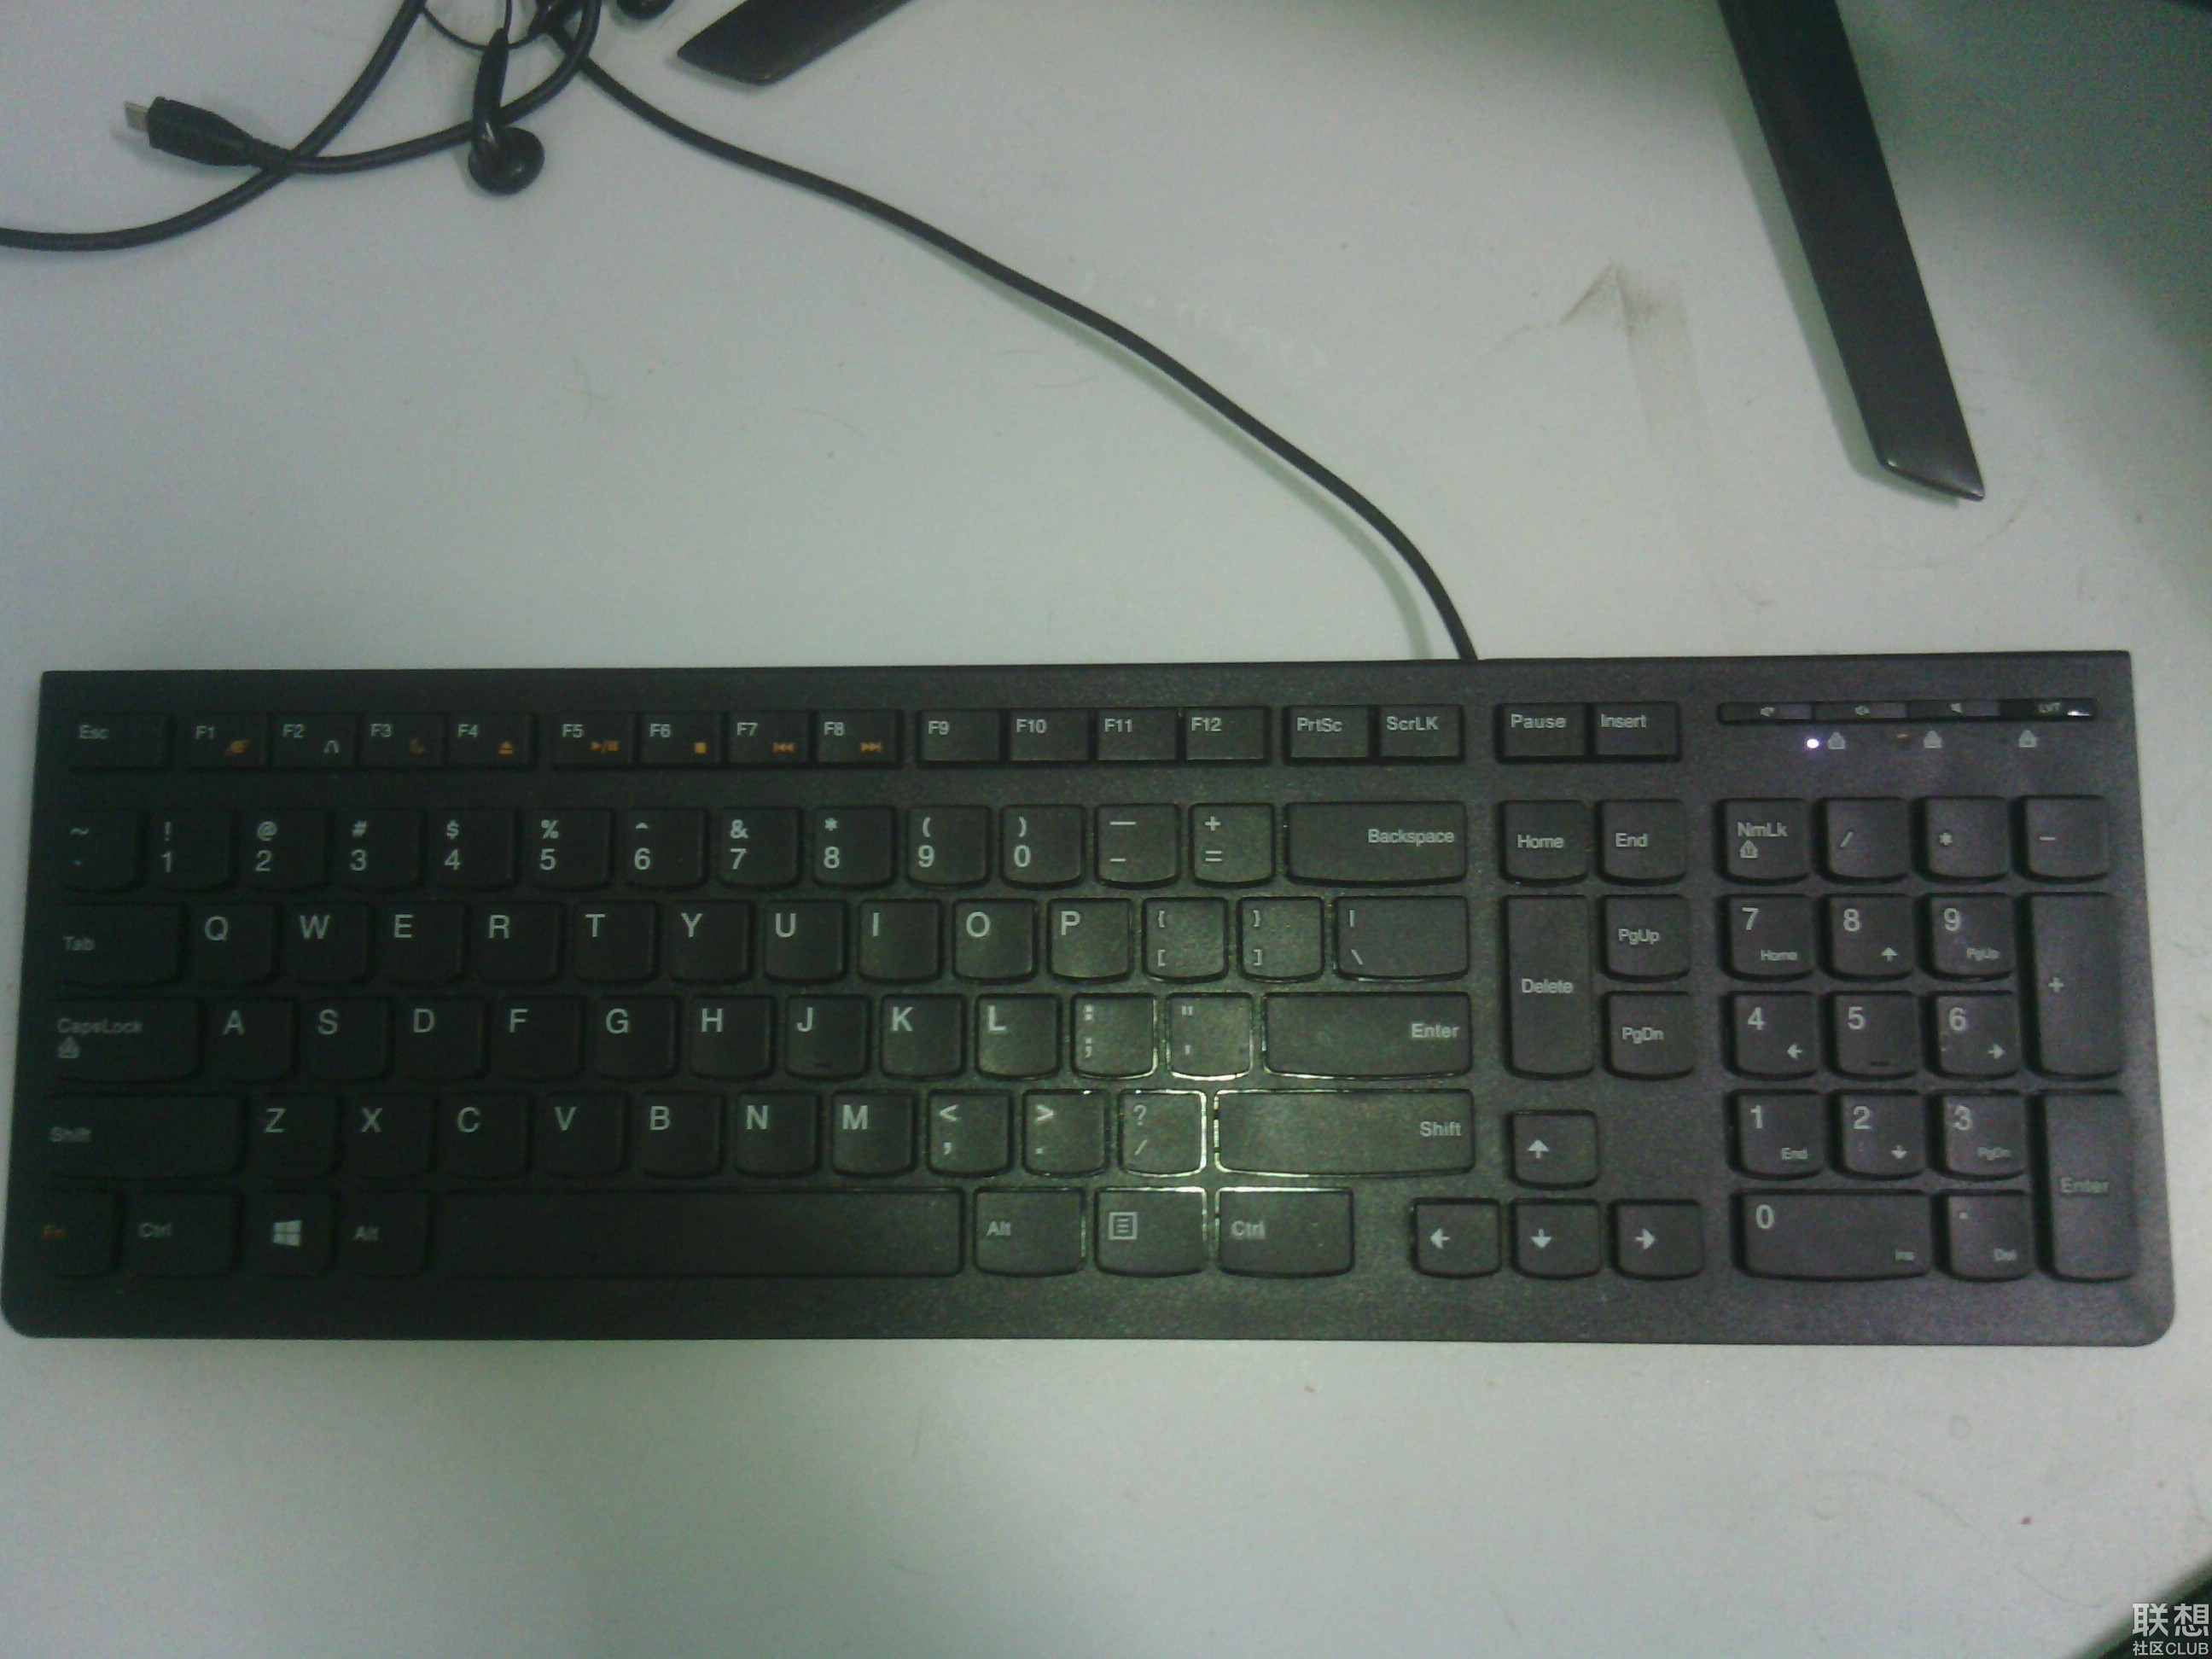 3x3扫描式键盘电路图